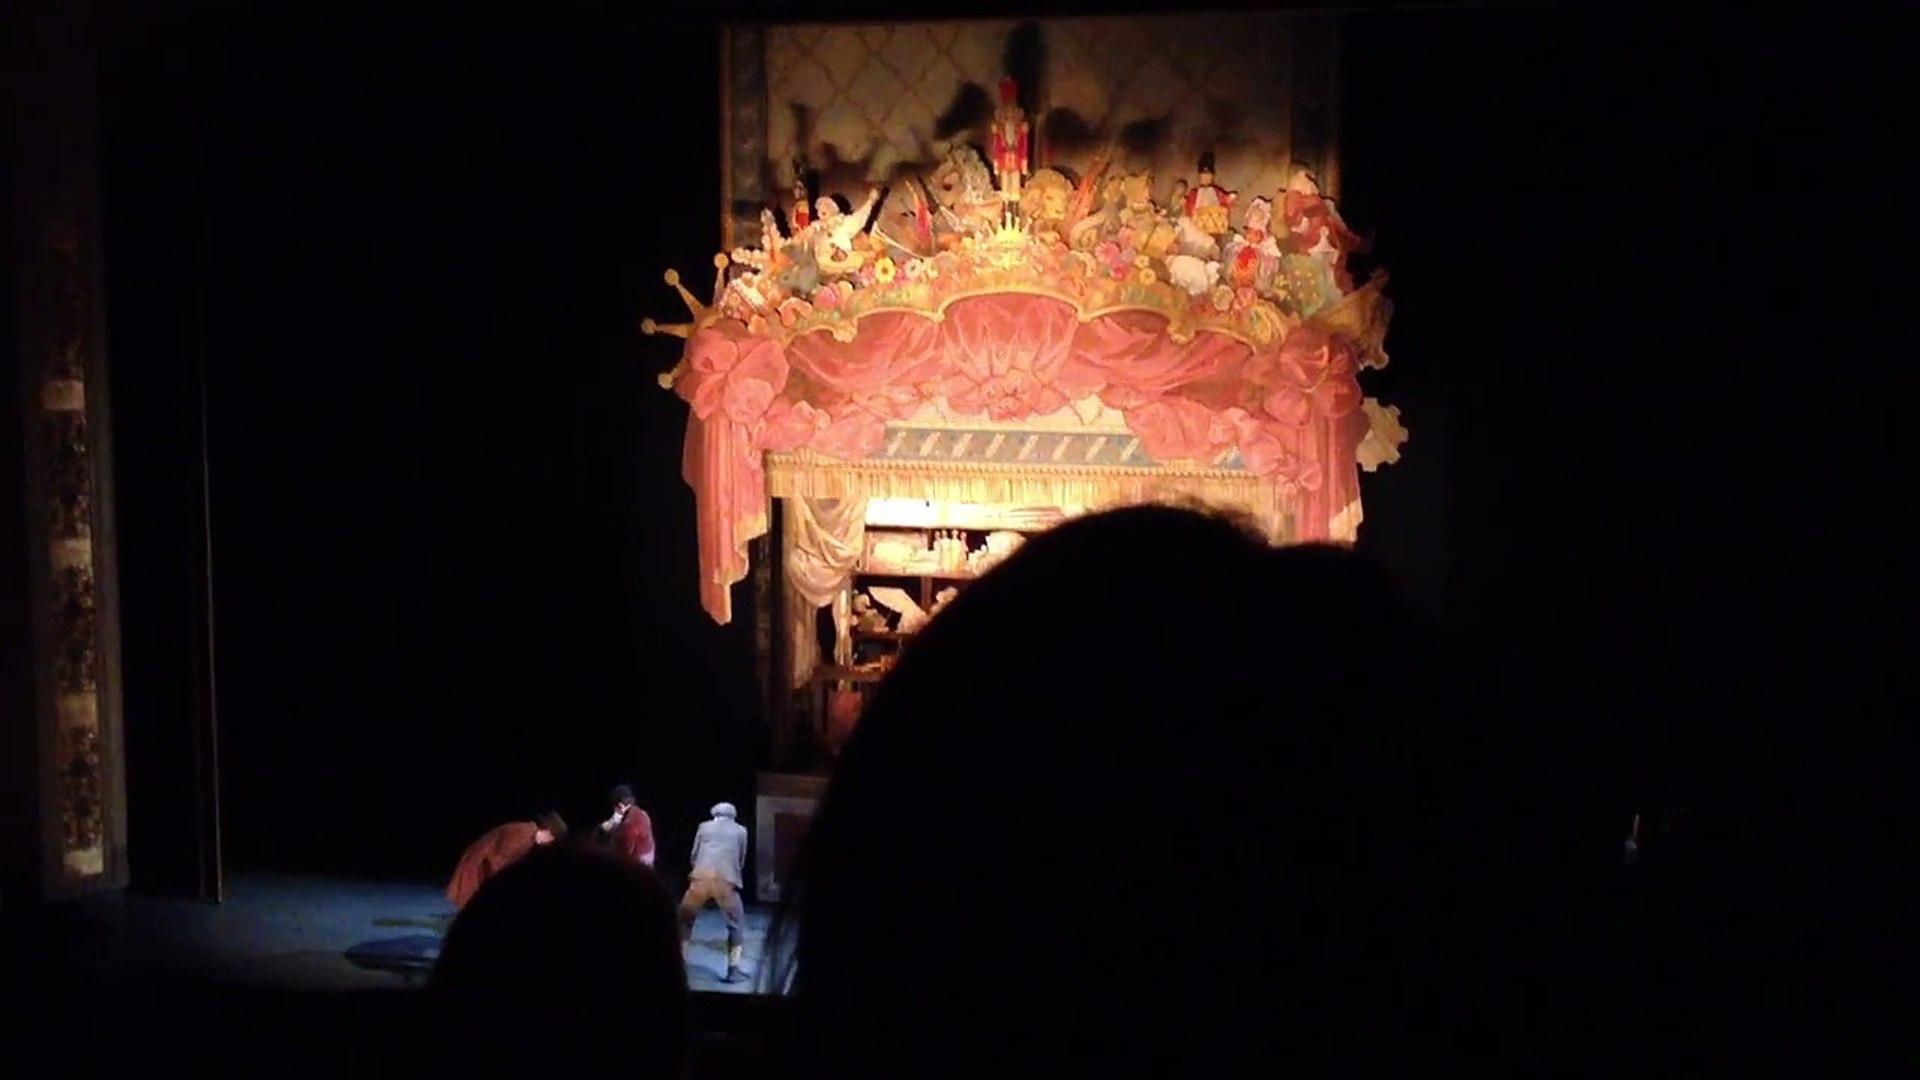 Щелкунчик, ч.1 - Акт 1, начало - Бостонский Балет - 29 декабря 2013